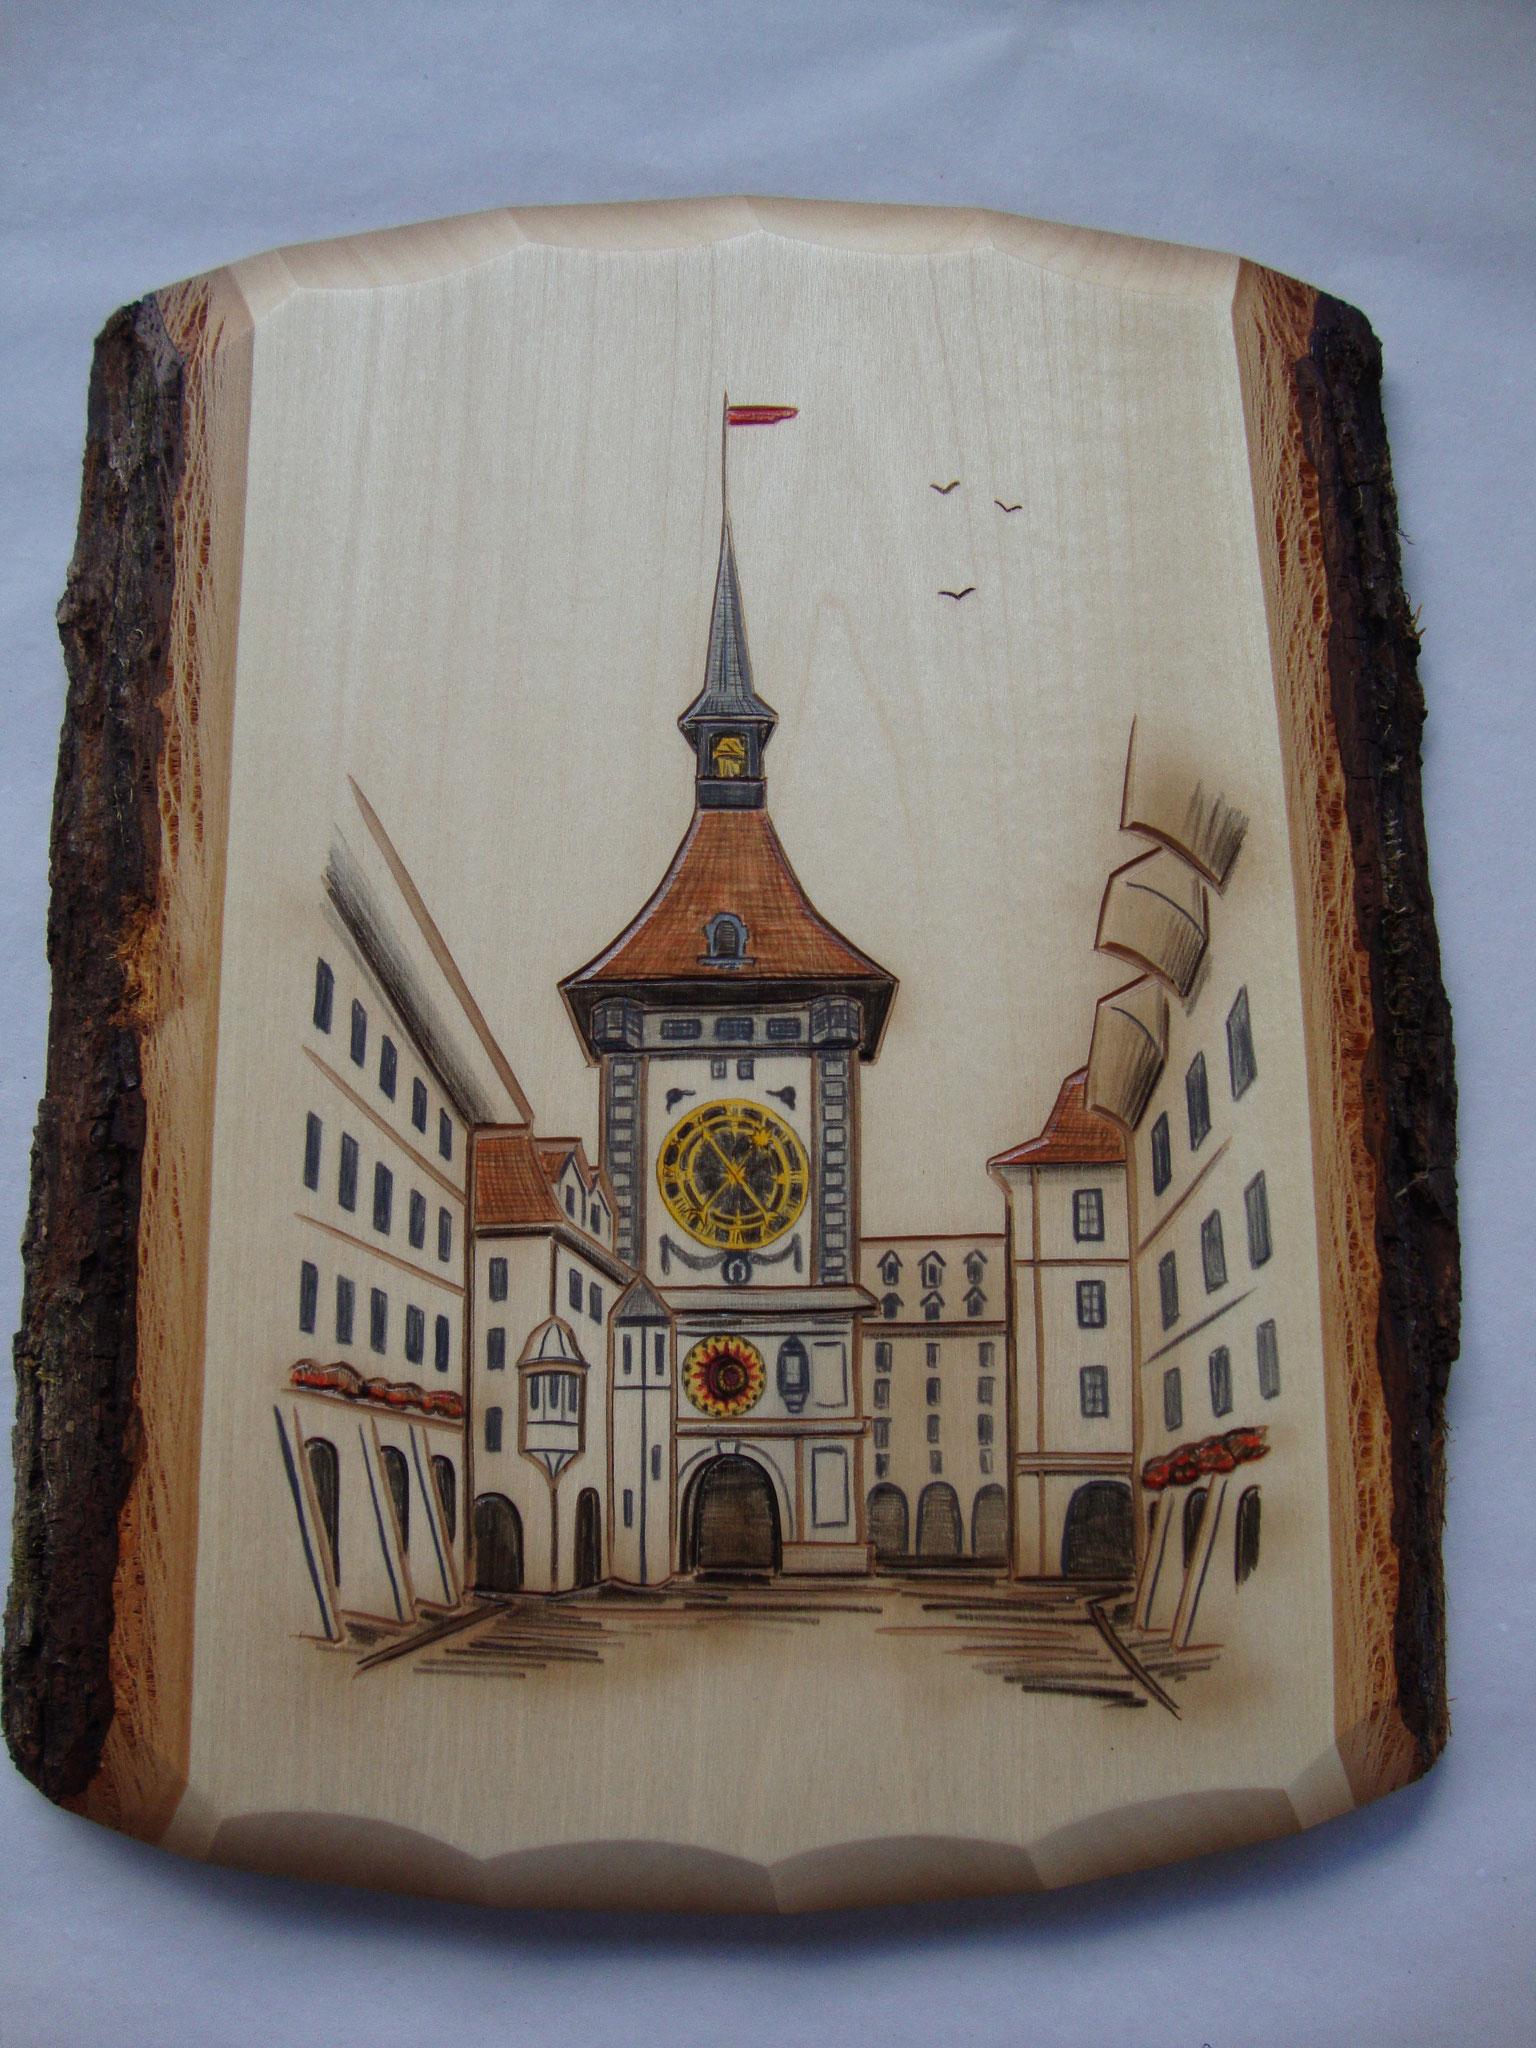 07.087.0F Zytglogge Bern